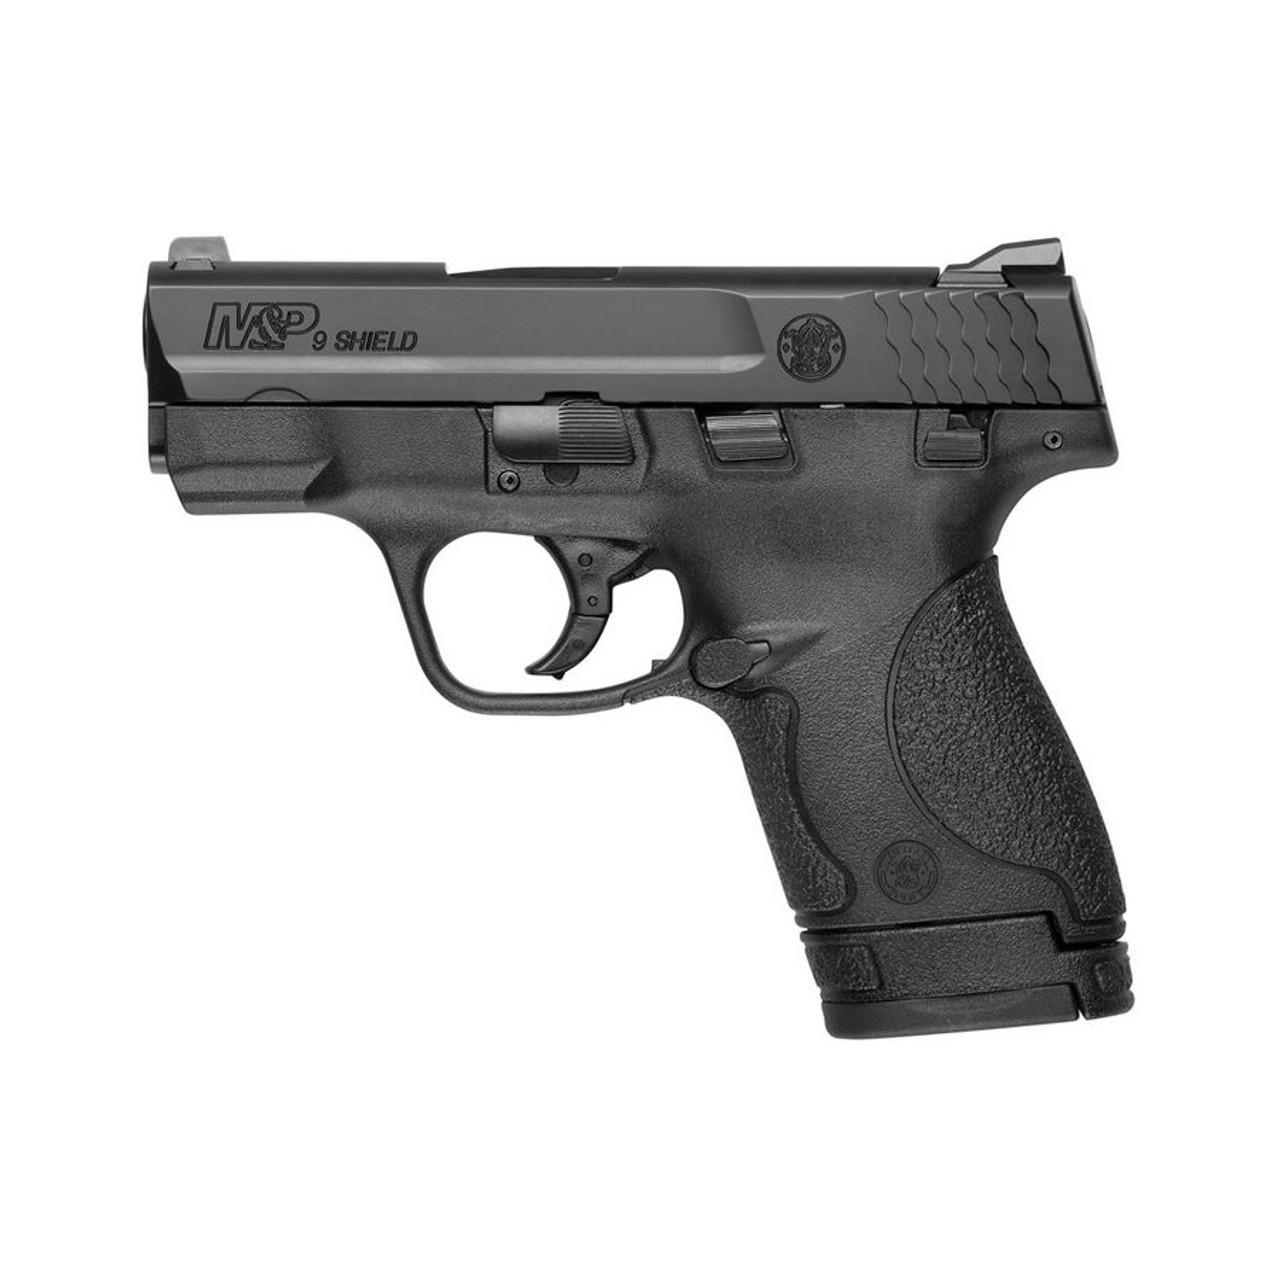 Smith & Wesson M&P9 Shield Pistol 9mm